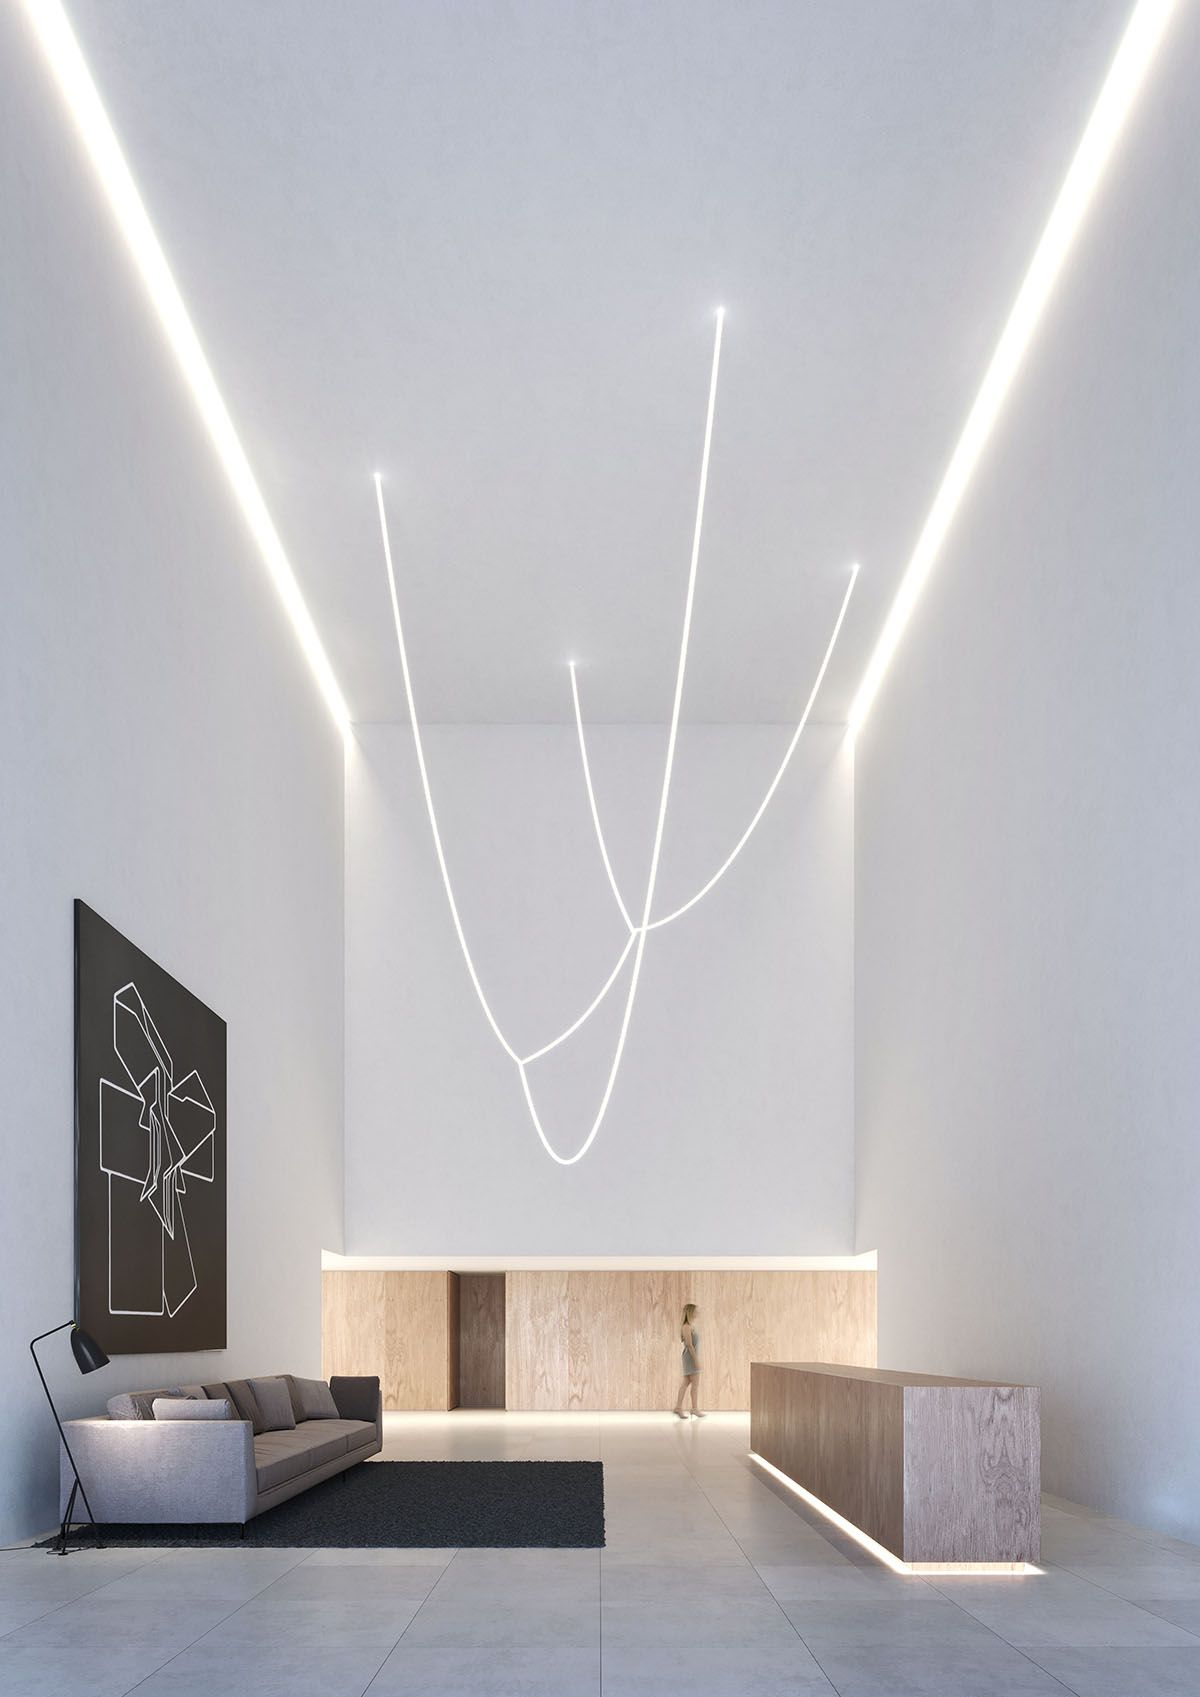 Fran Silvestre Arquitectos Unveils Kouros Tower With Clean Curves In Valencia Minimal House Design Lighting Design Interior Minimalism Interior